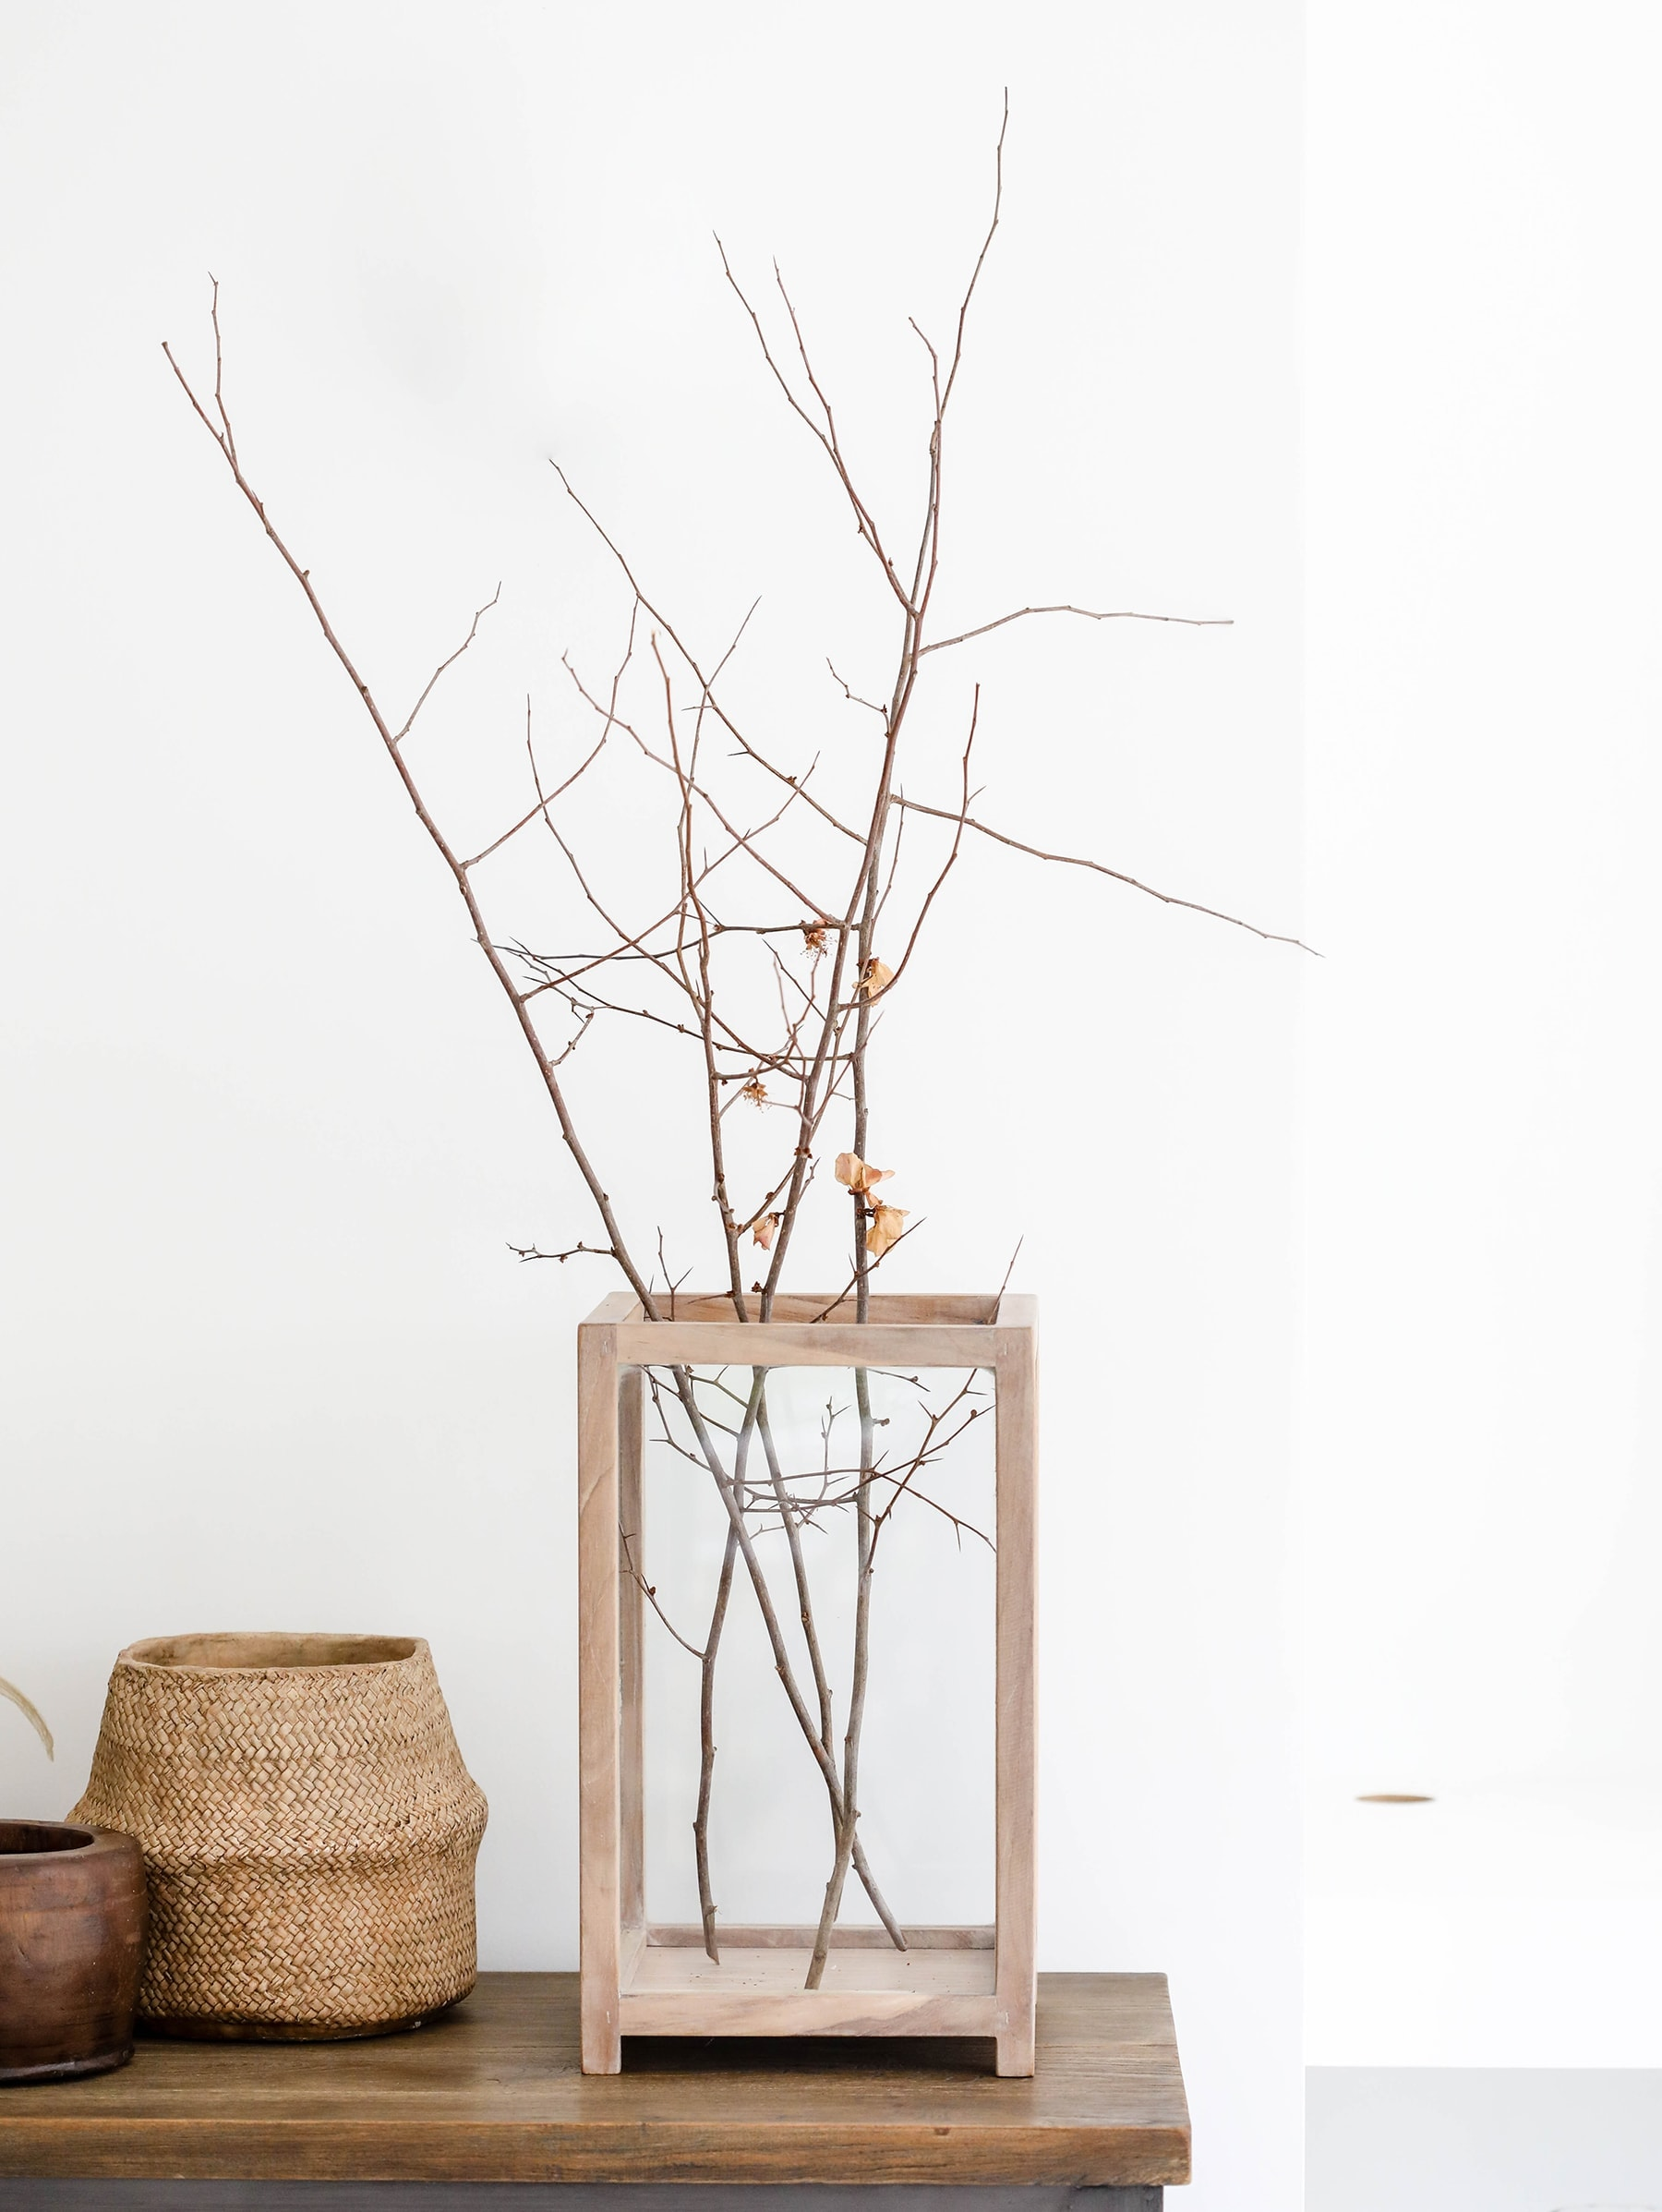 kenya candle holder ox design autumn decorating vignette twigs in glass vase